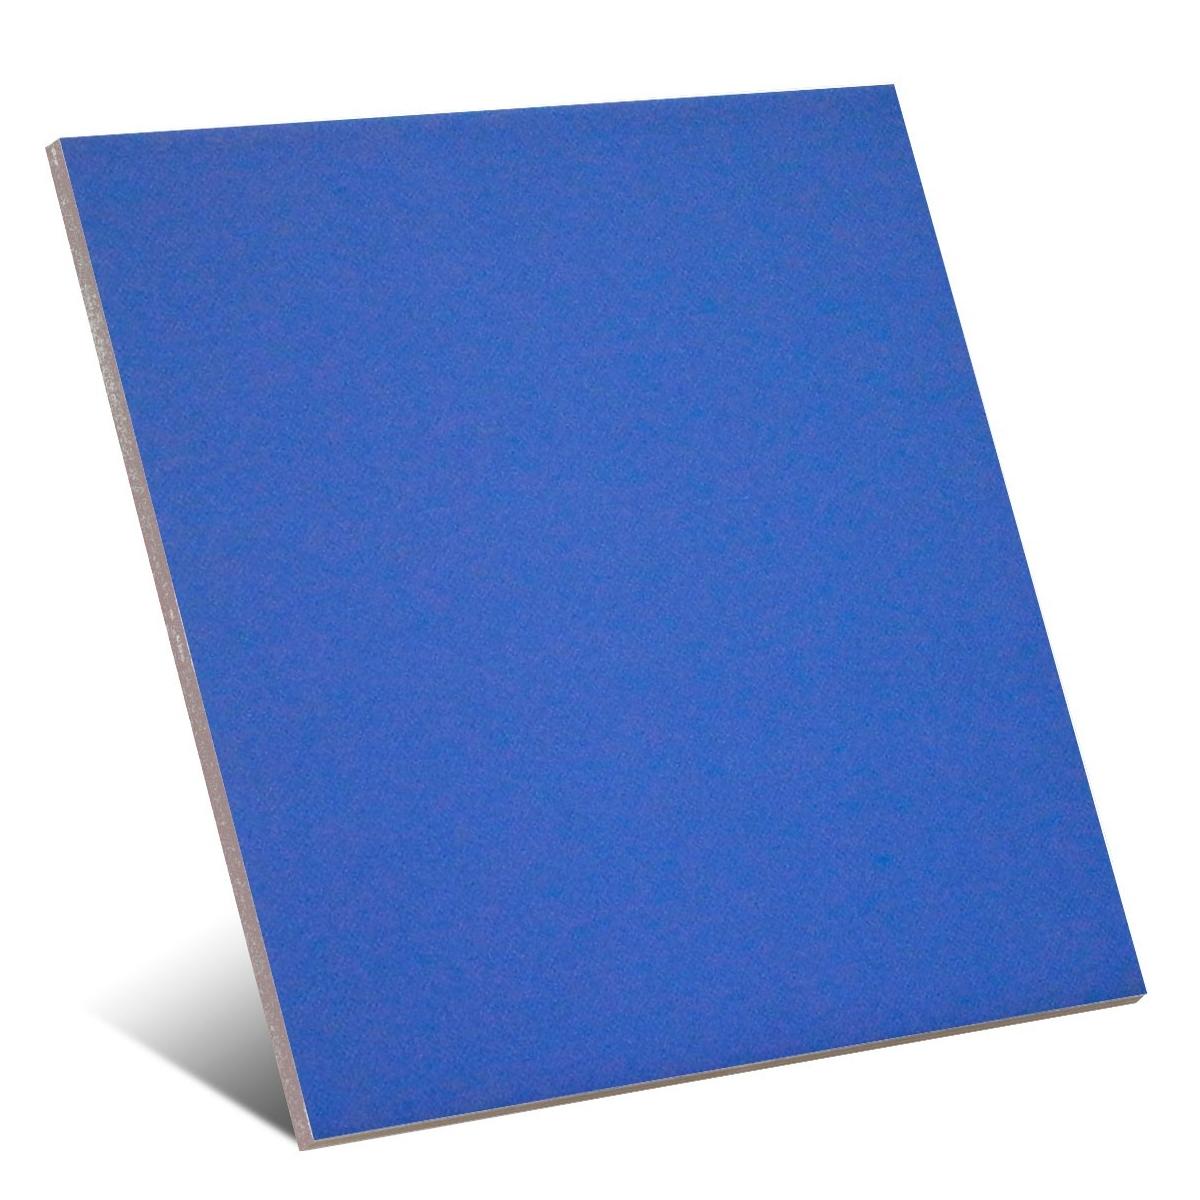 Victorian Azul Liso 20x20 (m2)